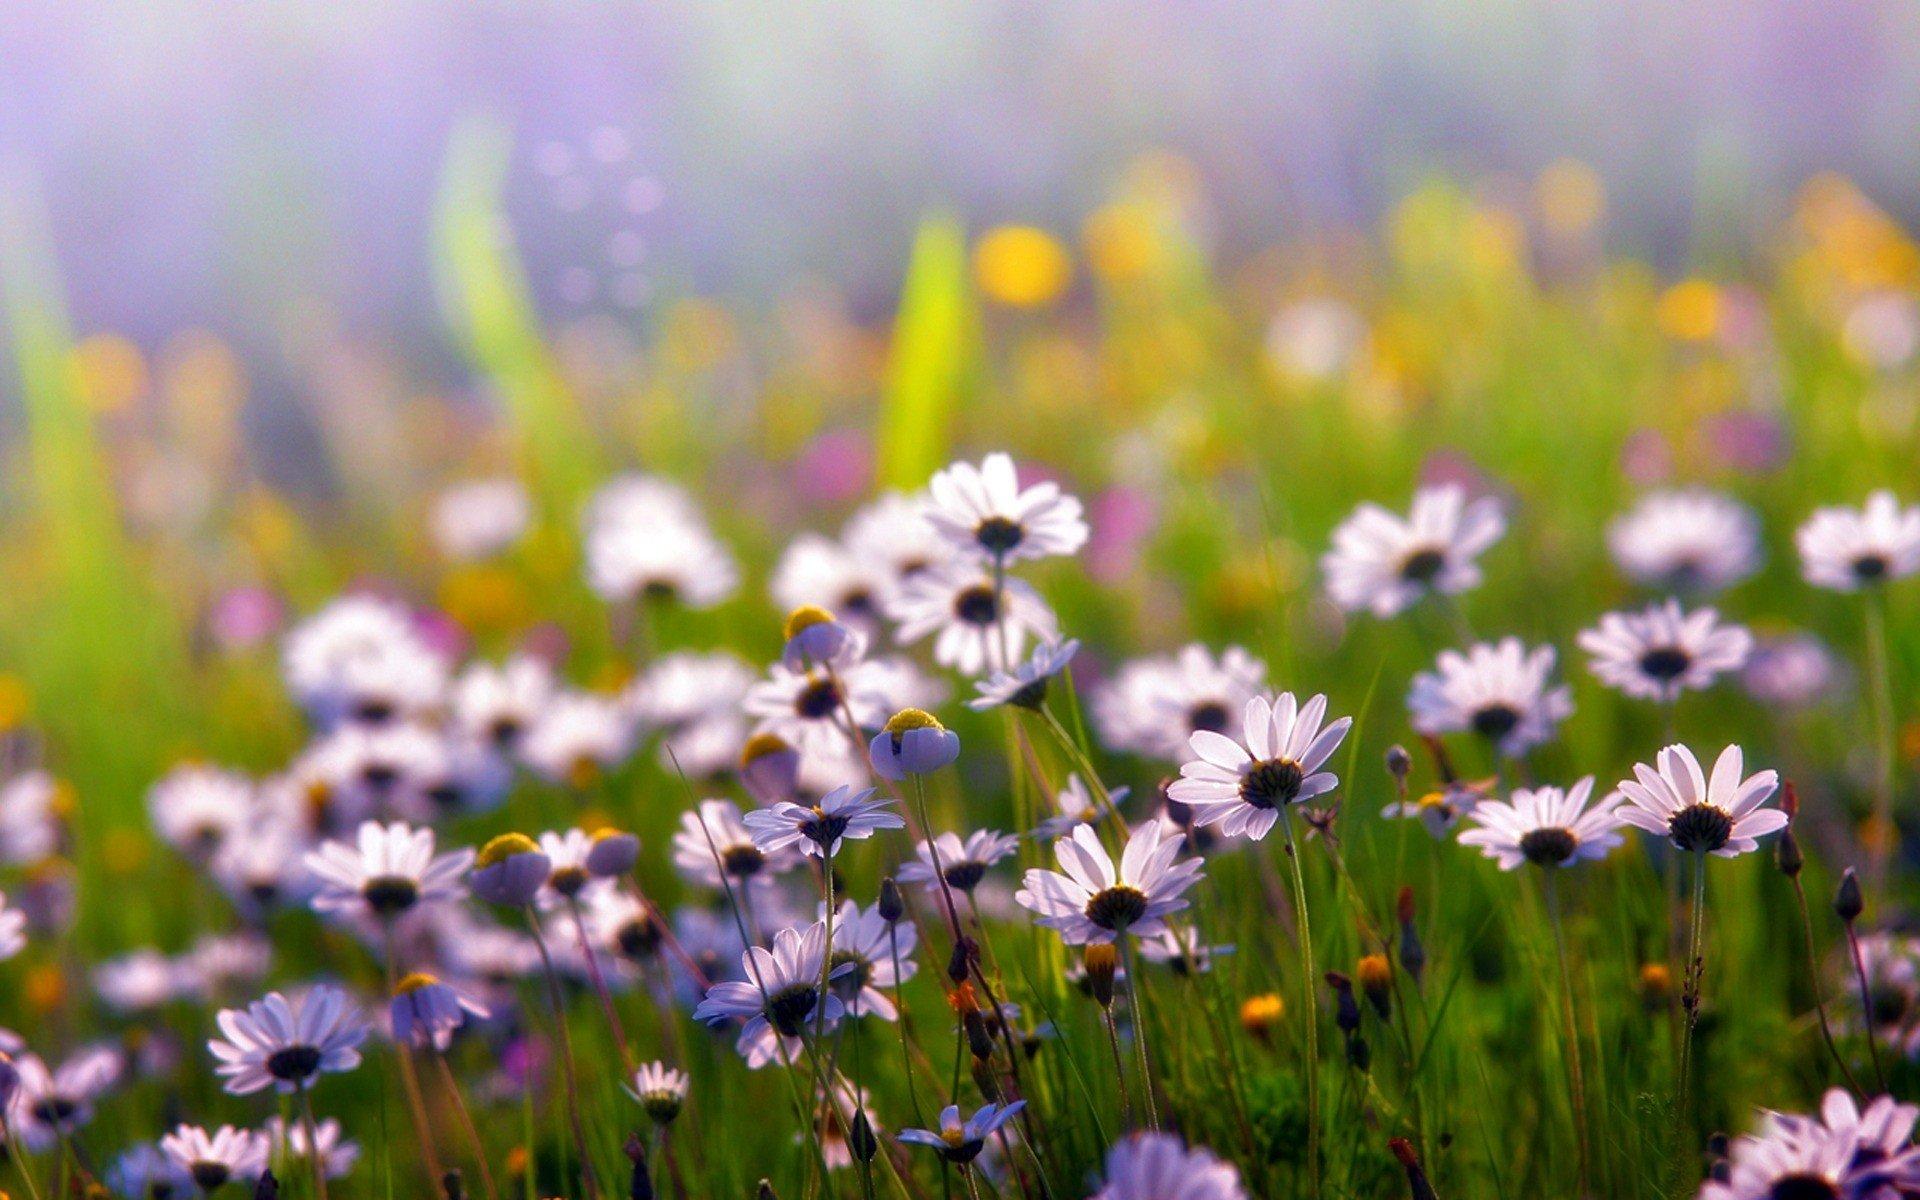 ромашки поле цветы chamomile field flowers загрузить